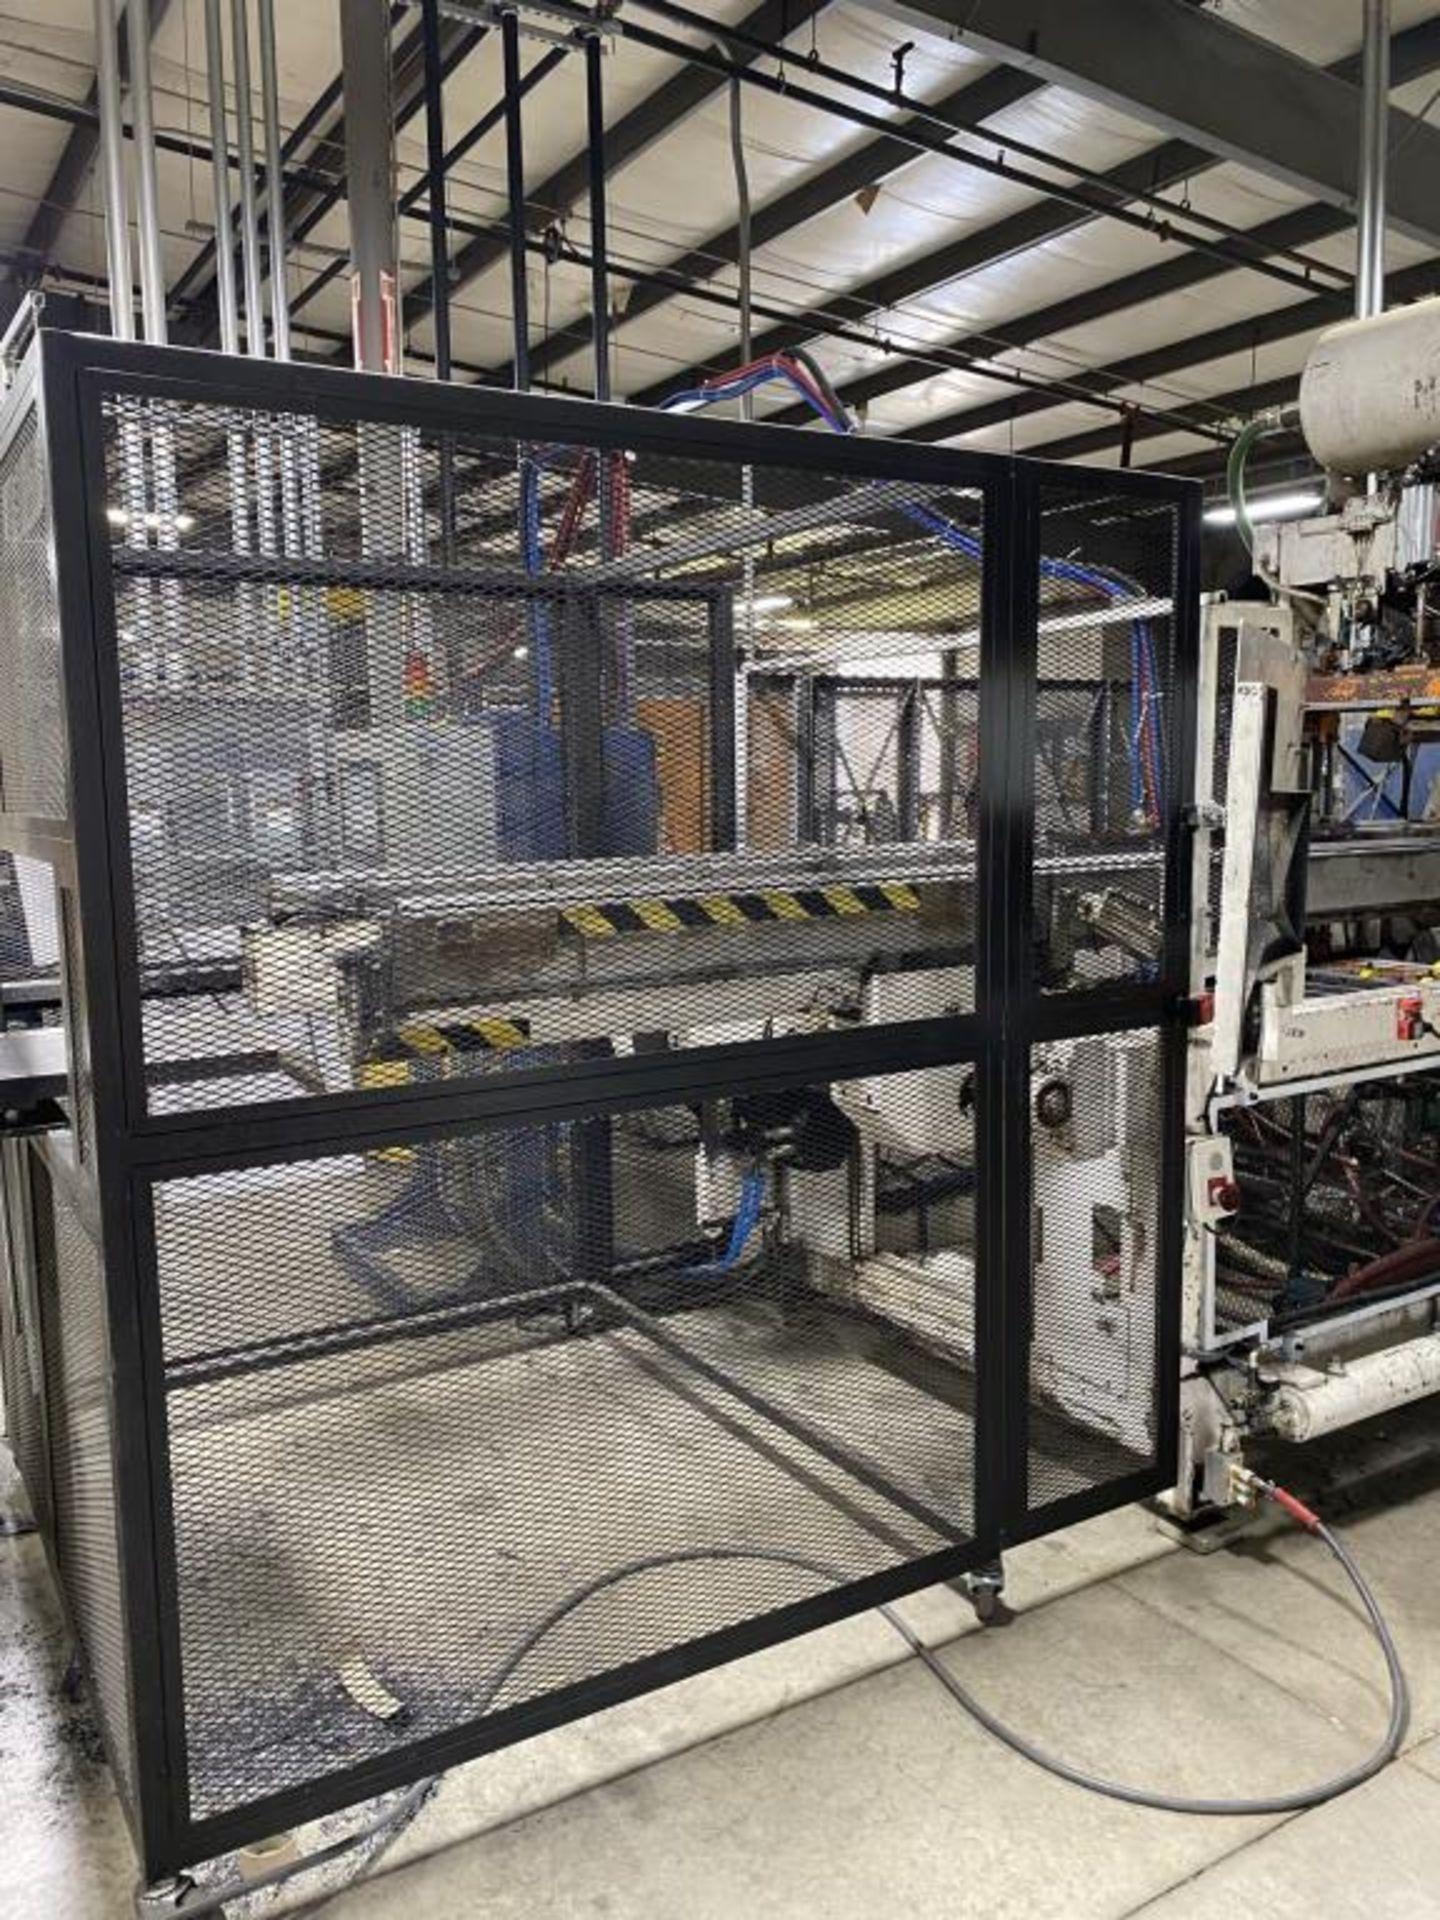 Rebuilt Thin Gauge Thermoformer - Image 10 of 18